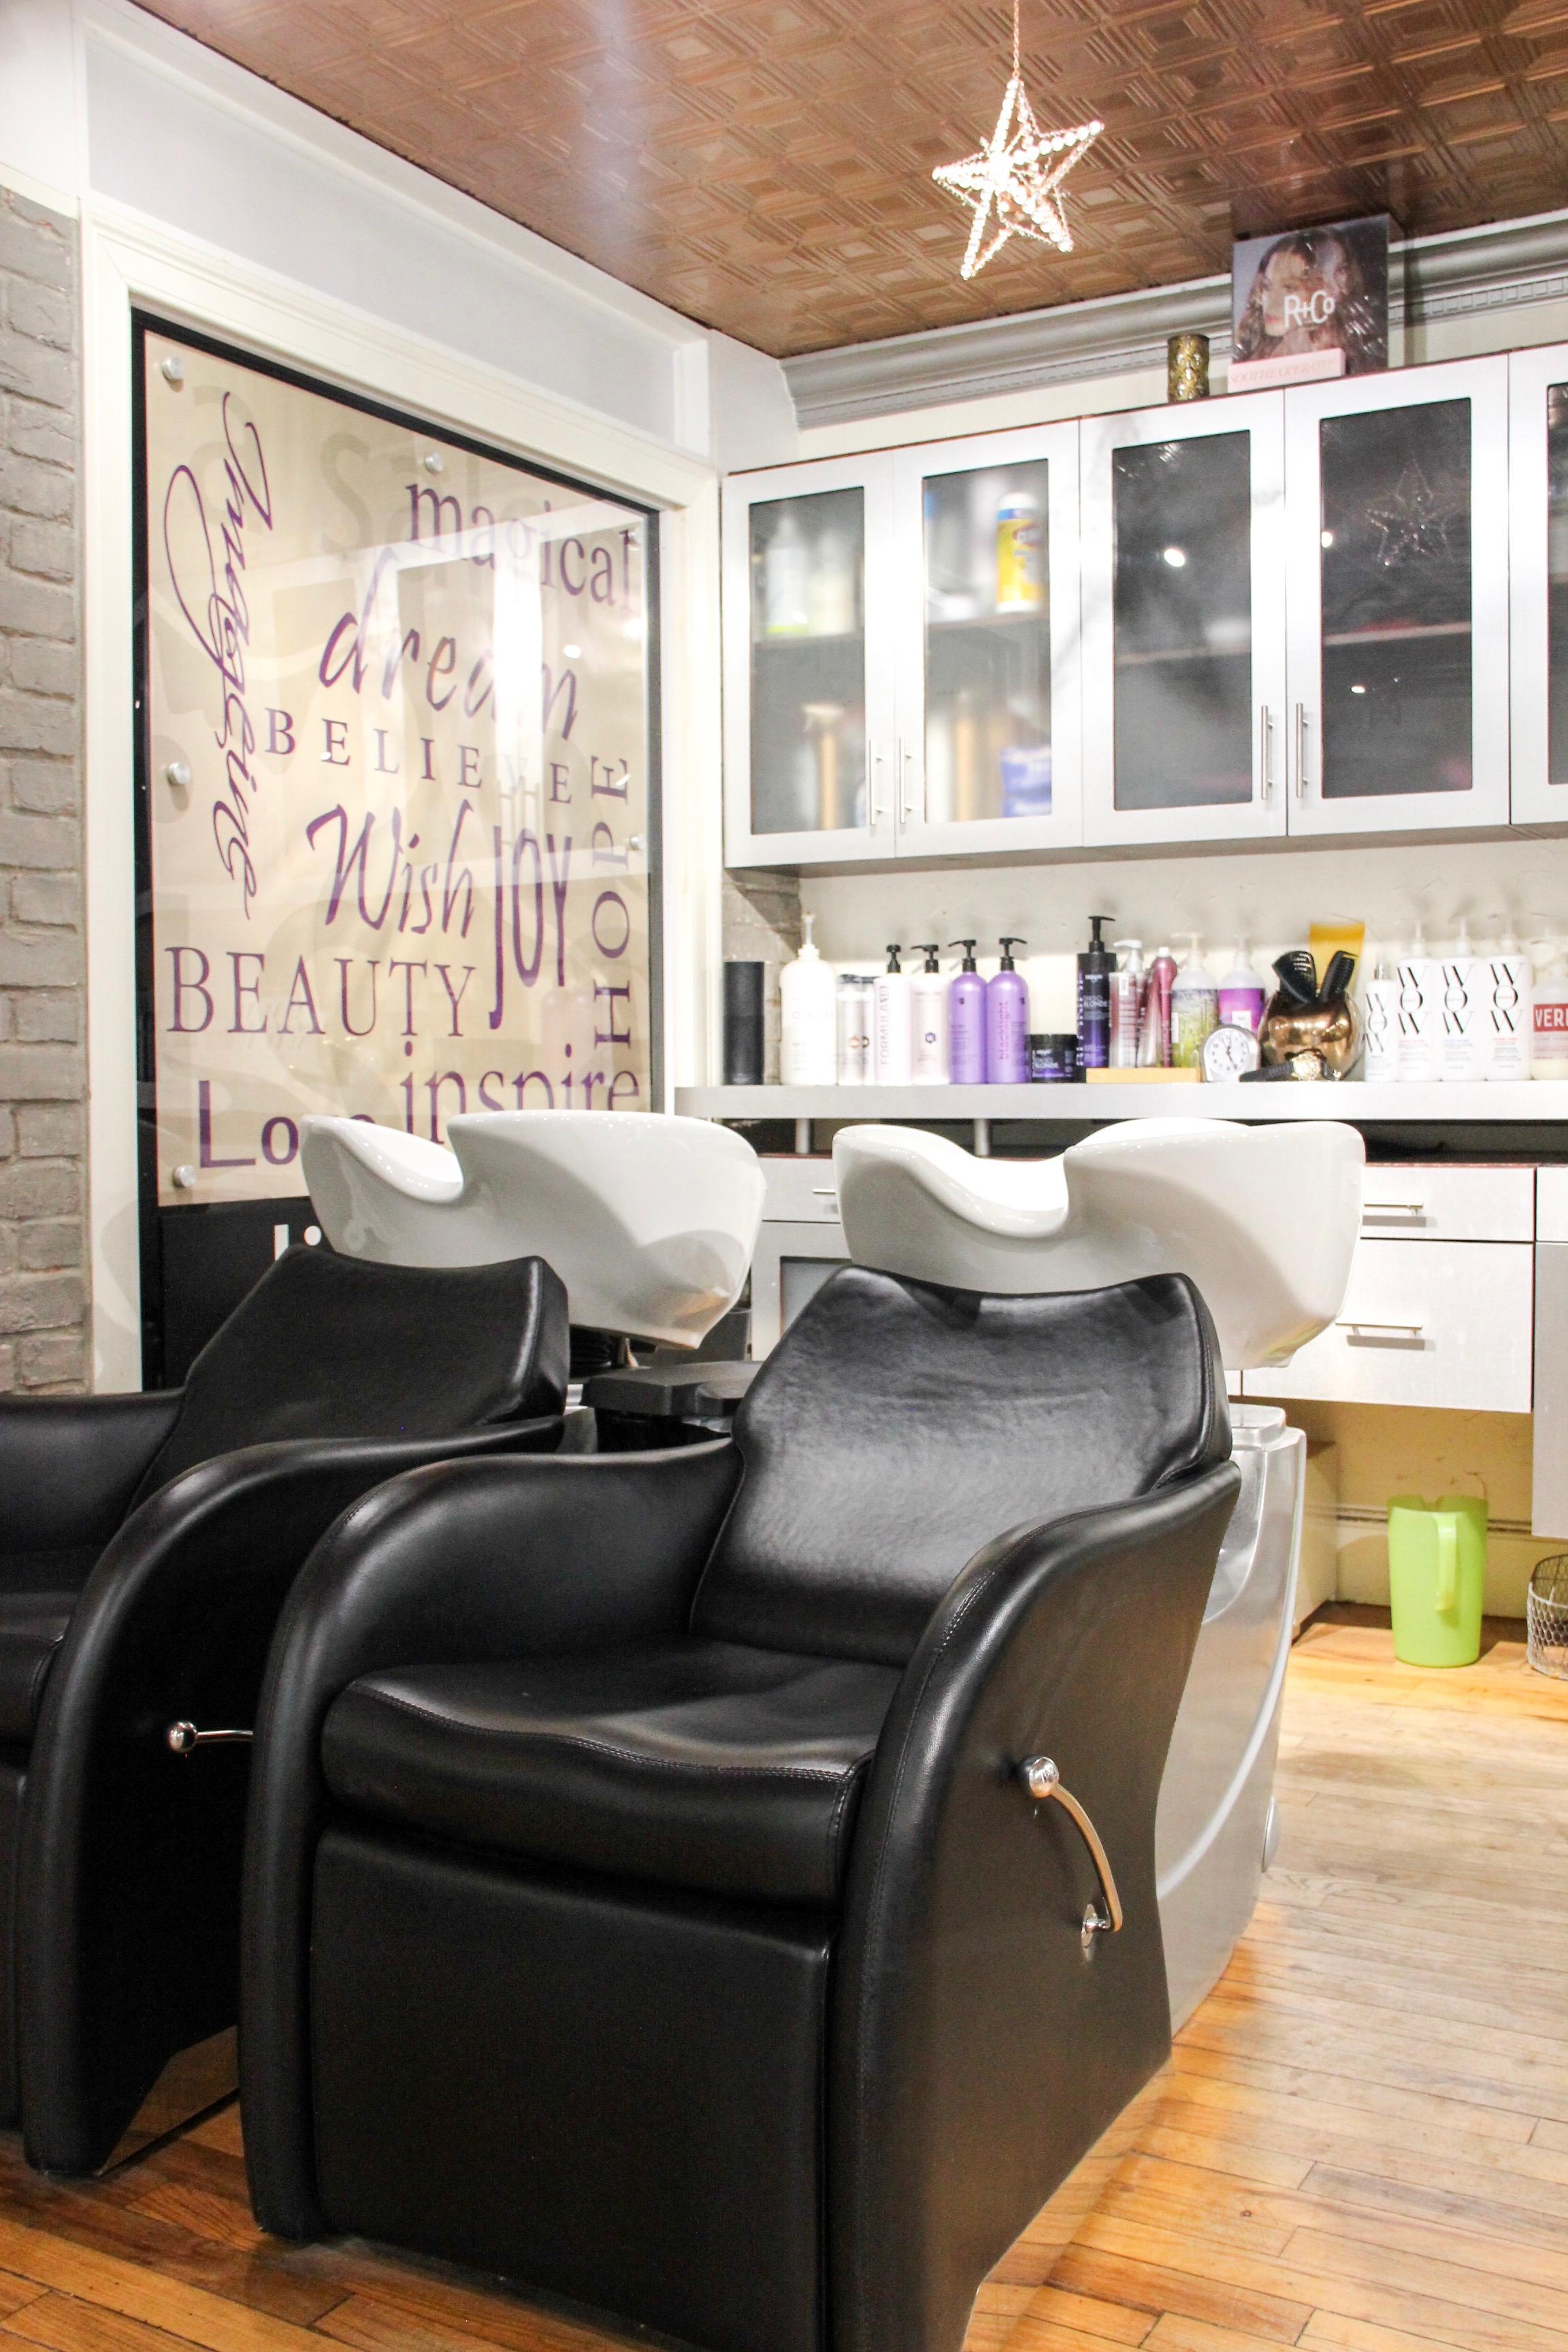 Lis A Lis Salon